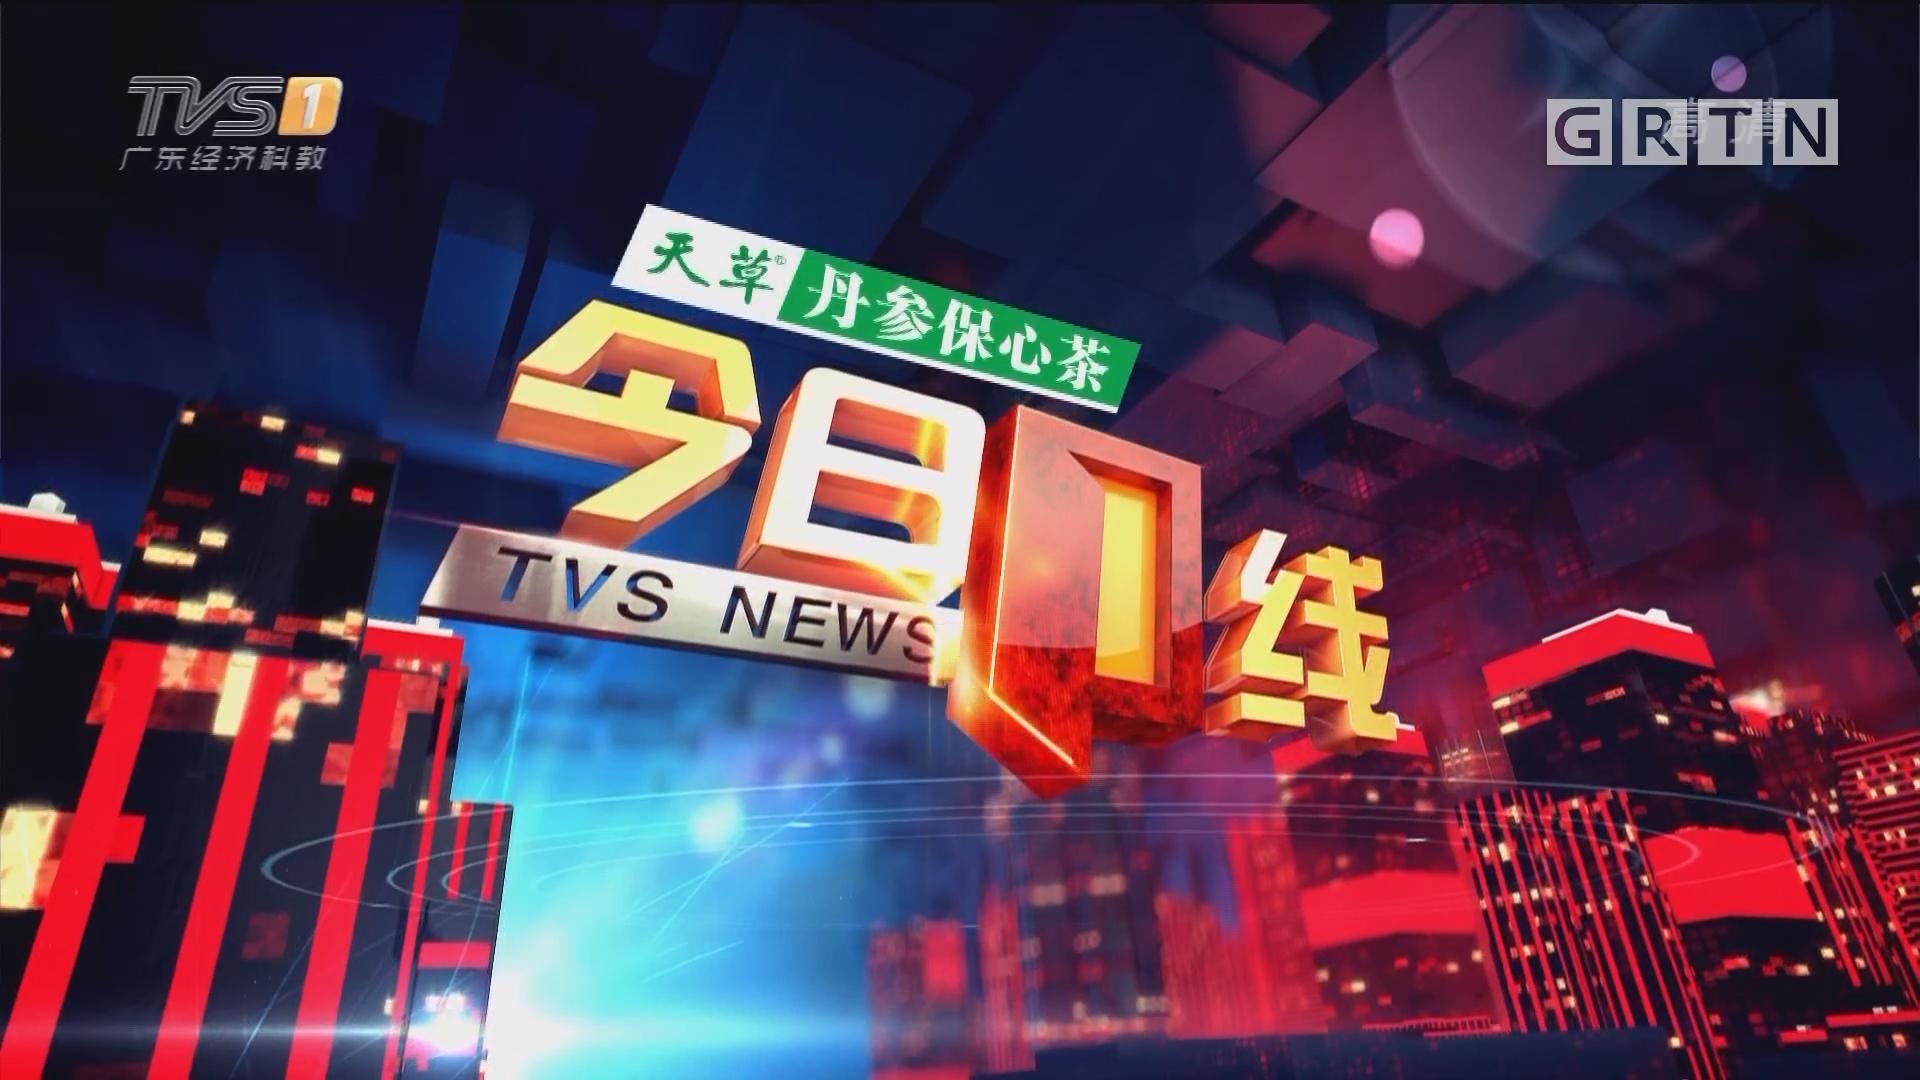 [HD][2019-04-24]今日一线:揭阳榕城:小车扯倒油枪 加油站被烧通顶